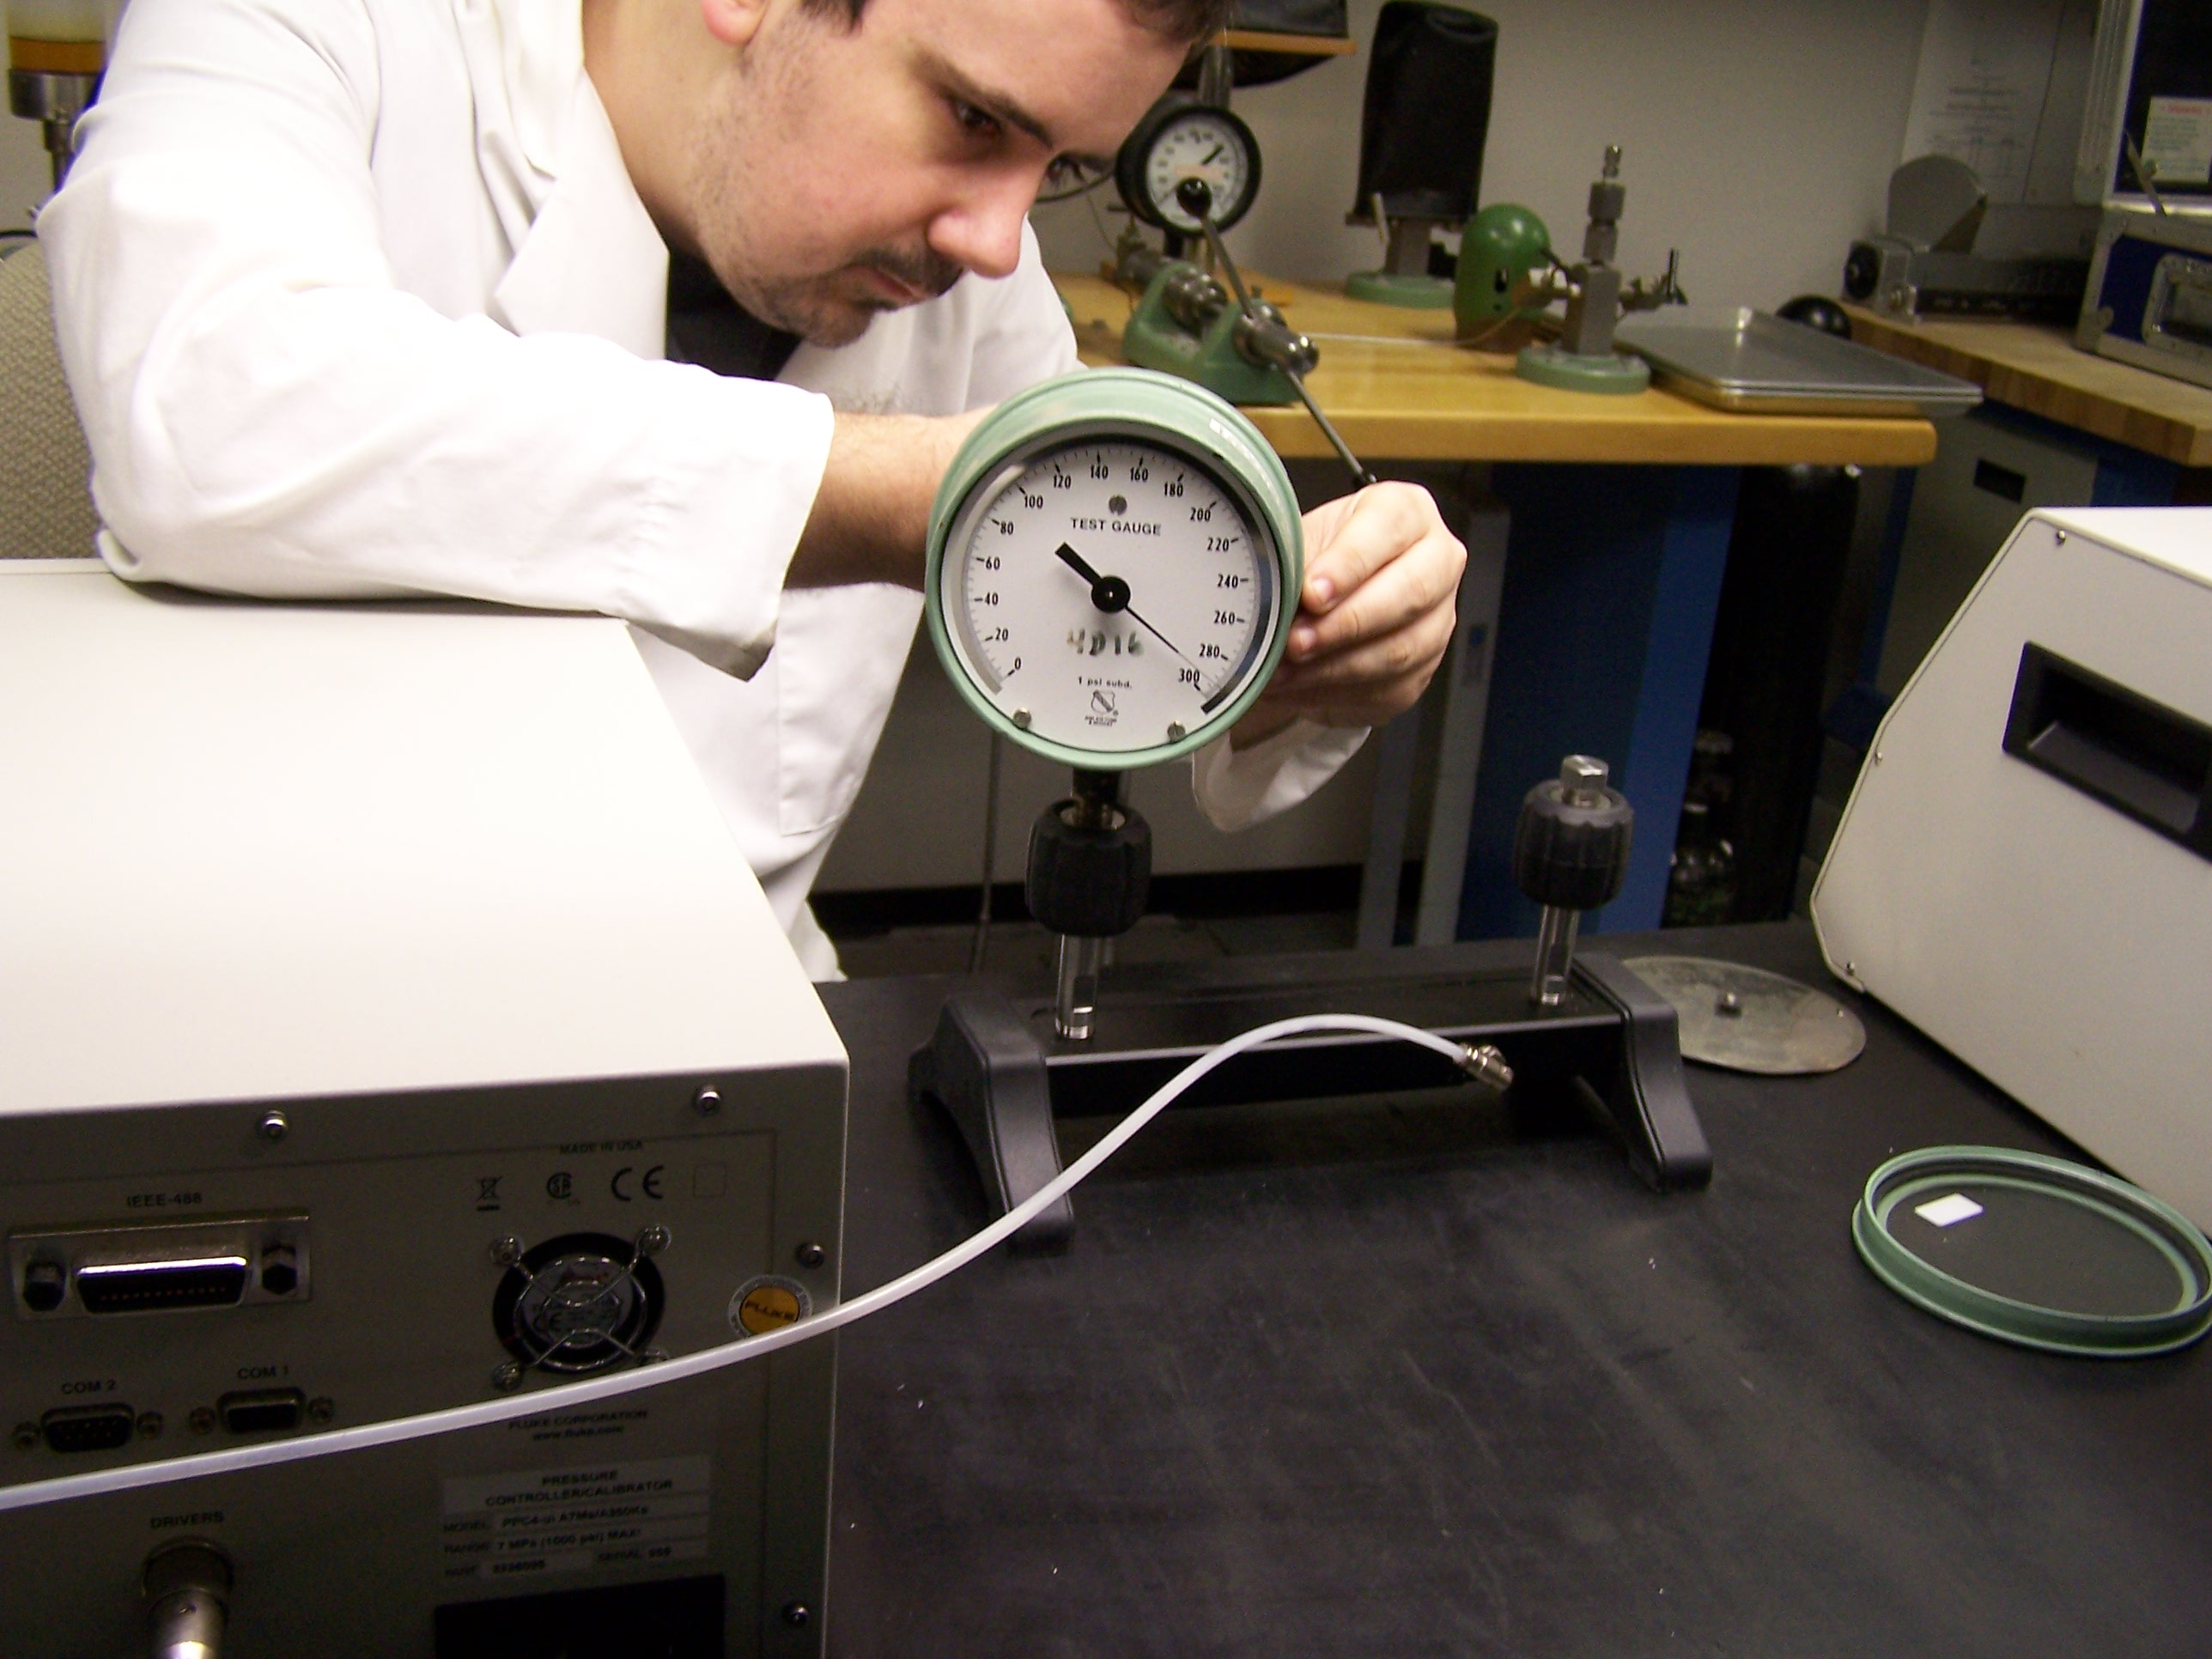 Accurate Instrument Repair Inc. has the capabilities to calibrate ...